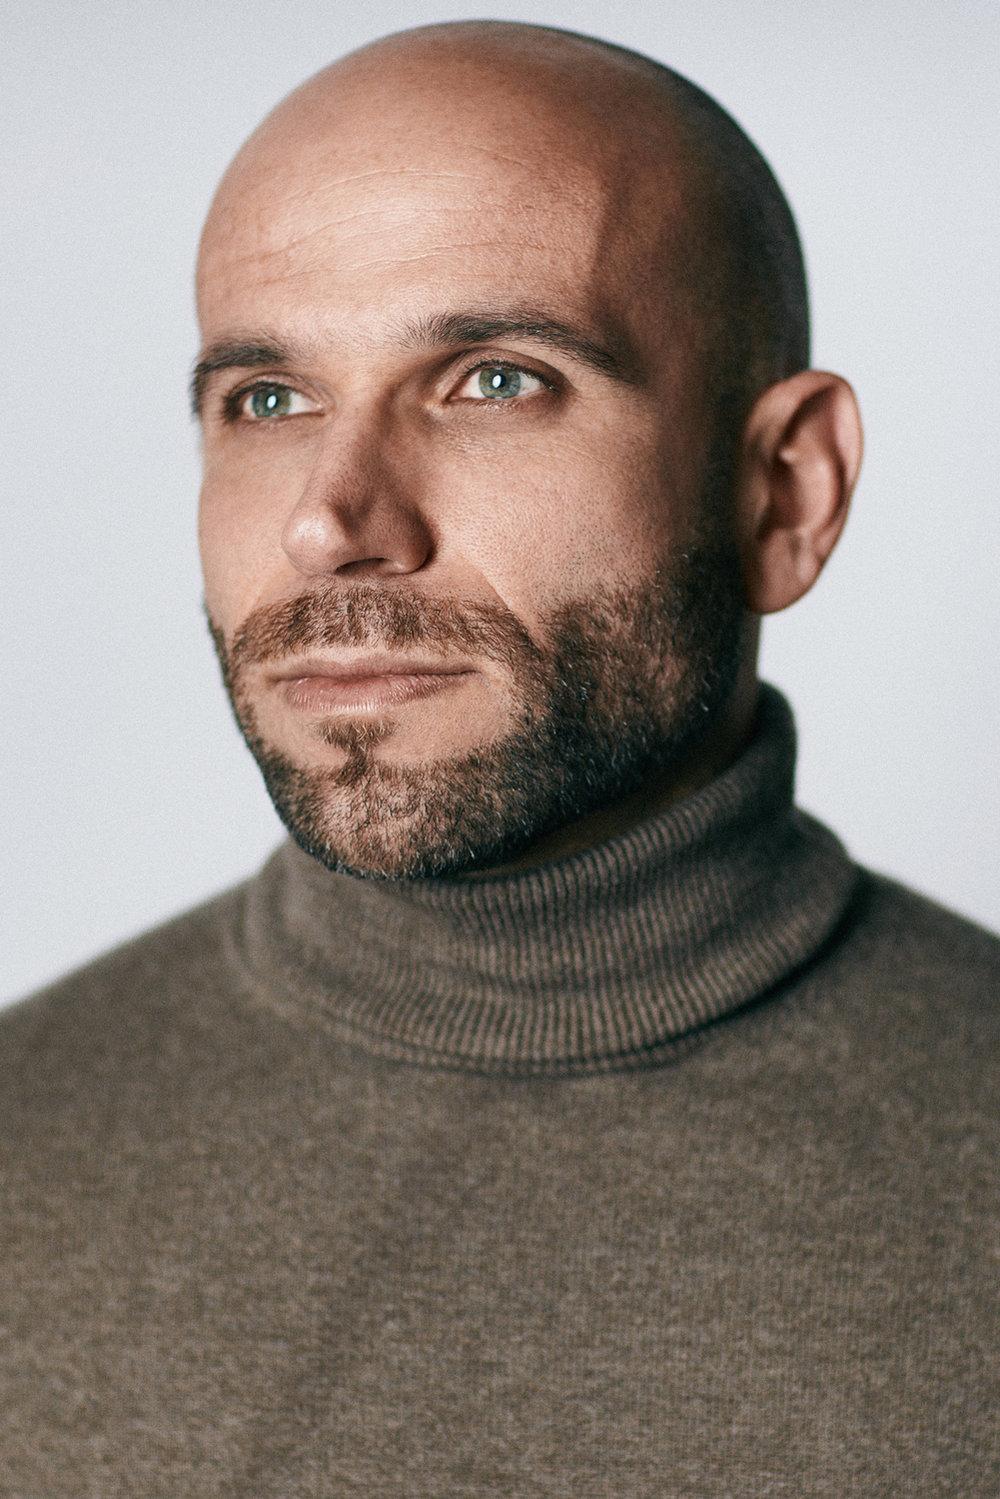 Brian McNamara - Dublin headshot photography - Acting headshots - corporate headshots - social mediaLinkedIn profile photography - 26.jpg